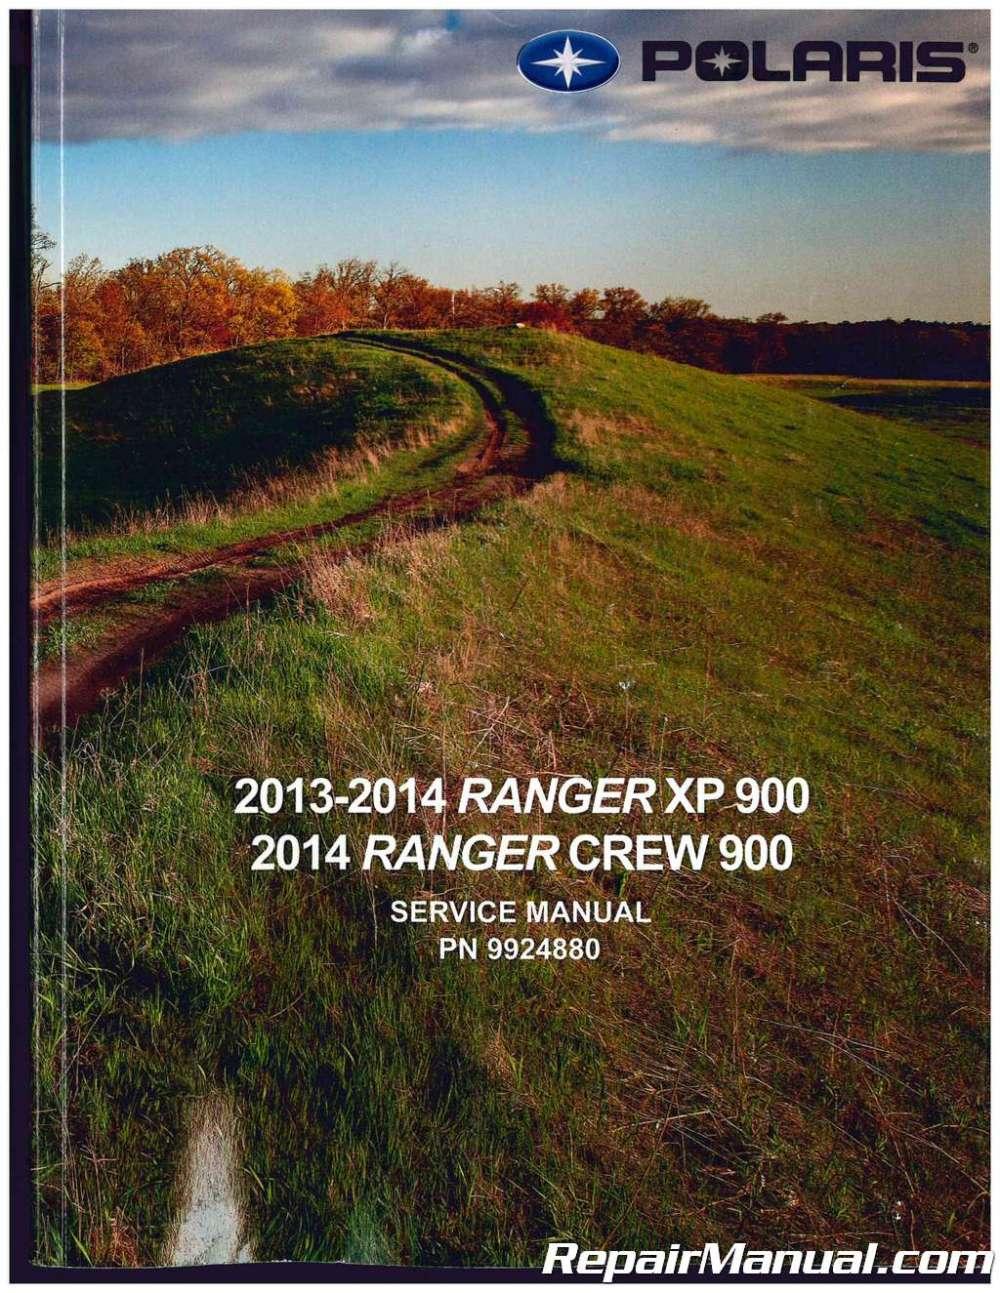 medium resolution of 2013 2014 polaris ranger xp 900 2014 ranger crew 900 side by side service manual